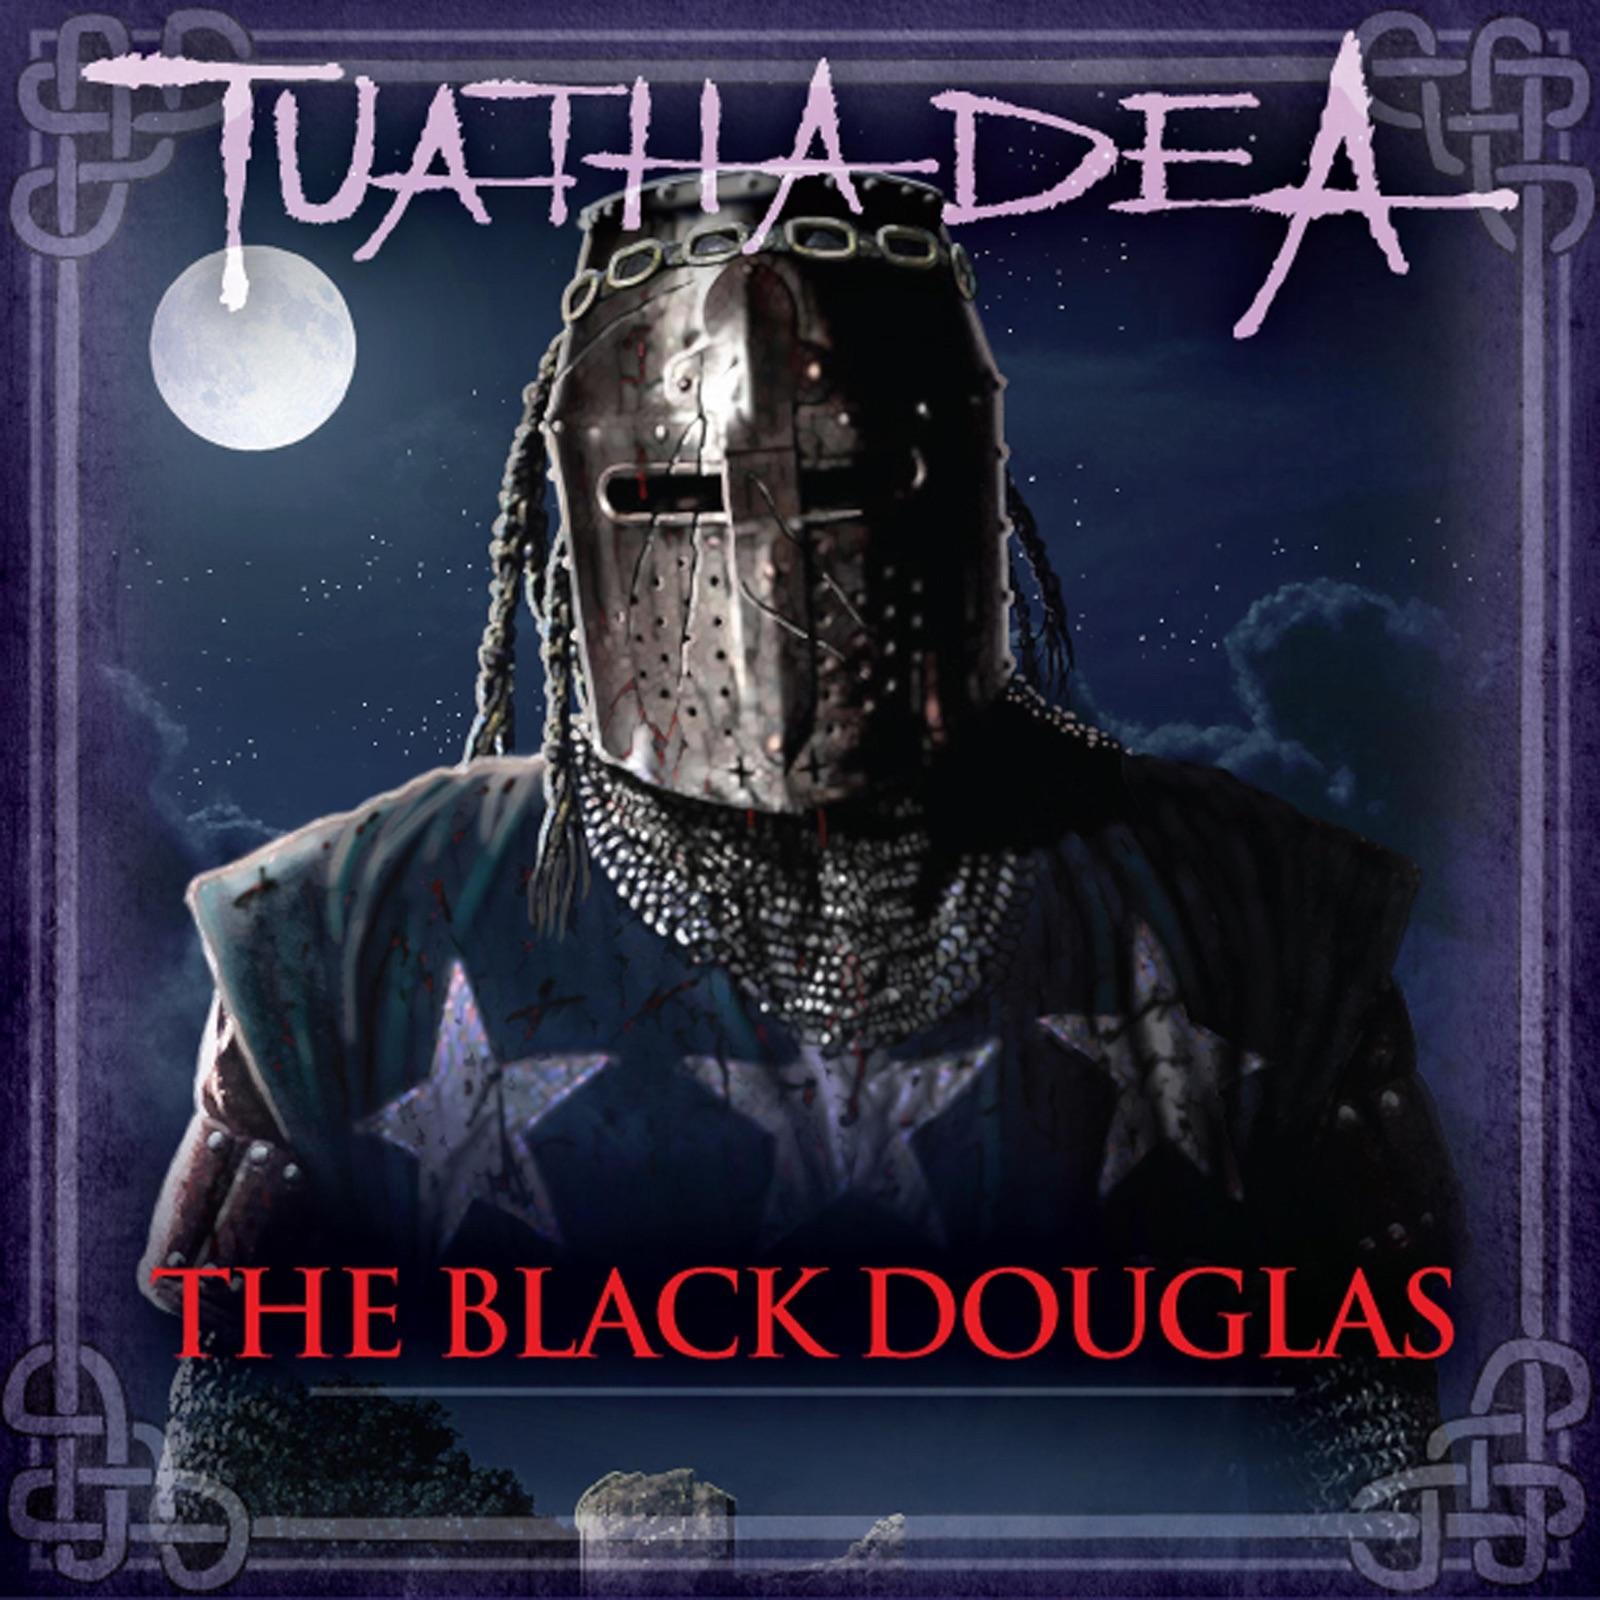 The Black Douglas - Single